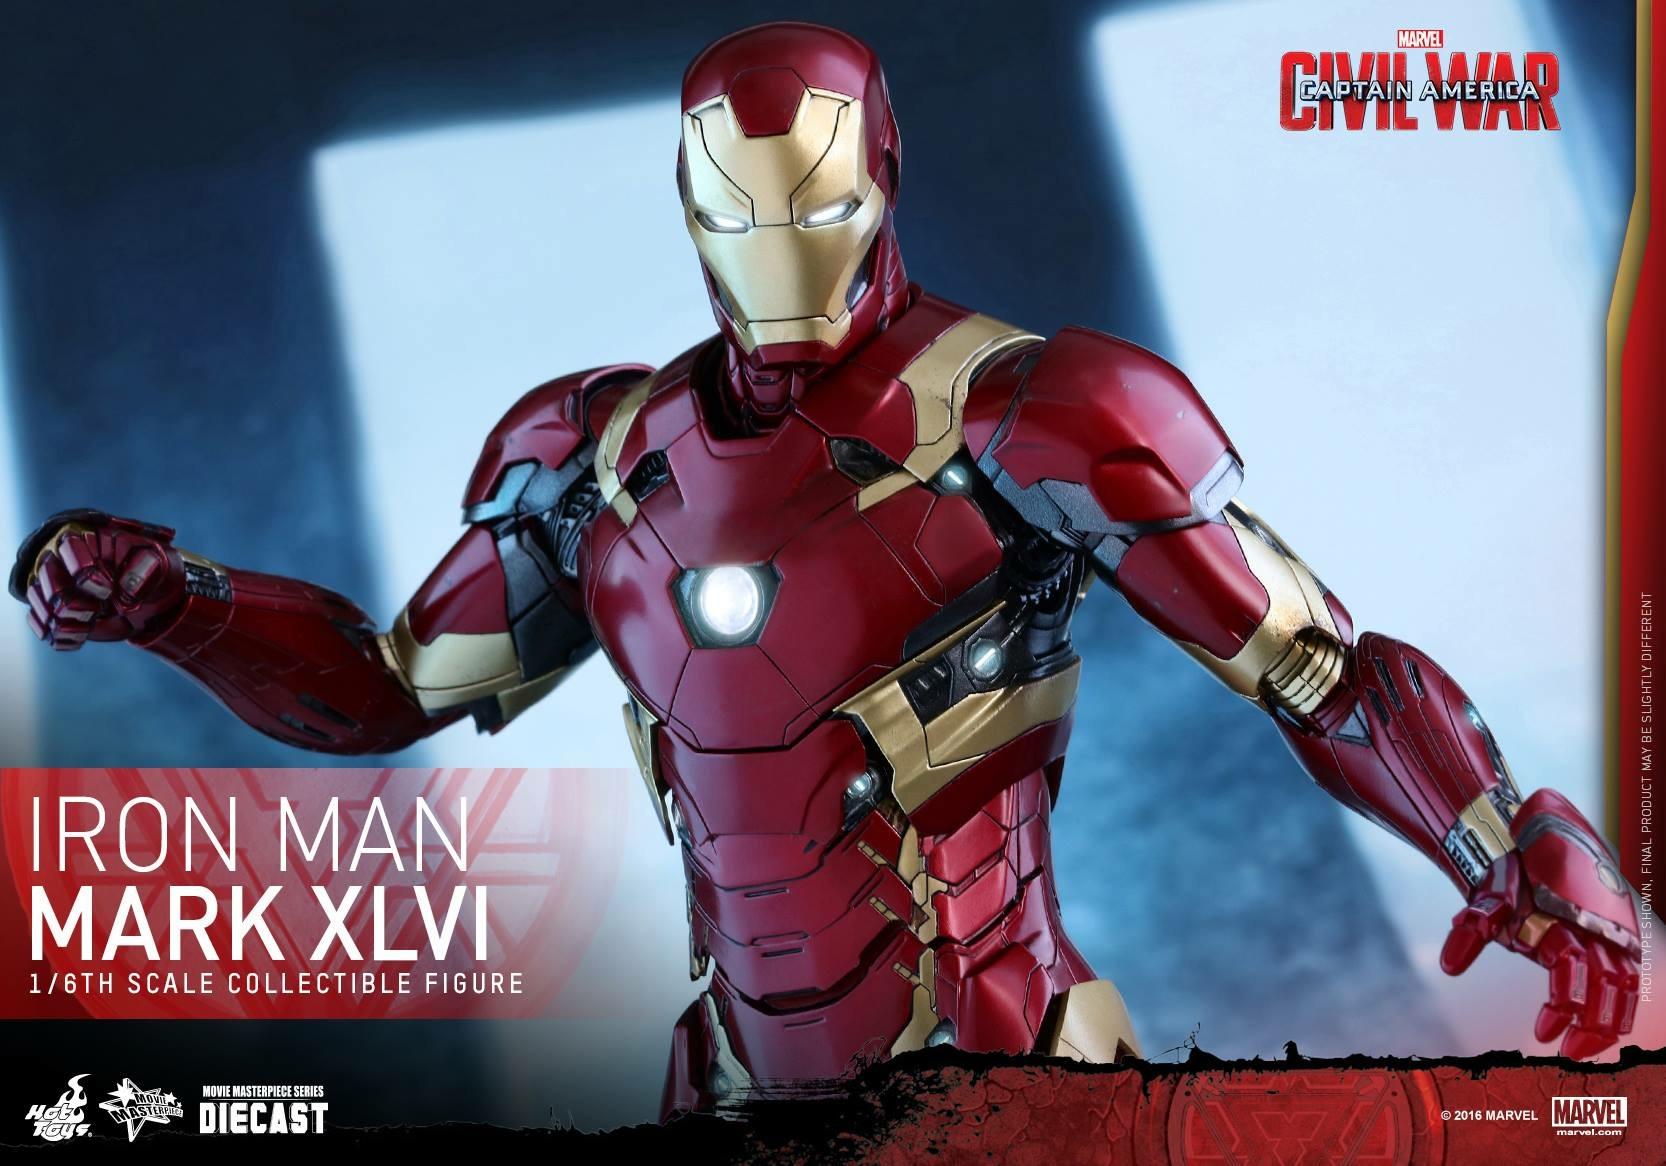 CAPTAIN AMERICA : CIVIL WAR - IRON MAN MARK XLVI (MMS353DC16) 160419024057799880